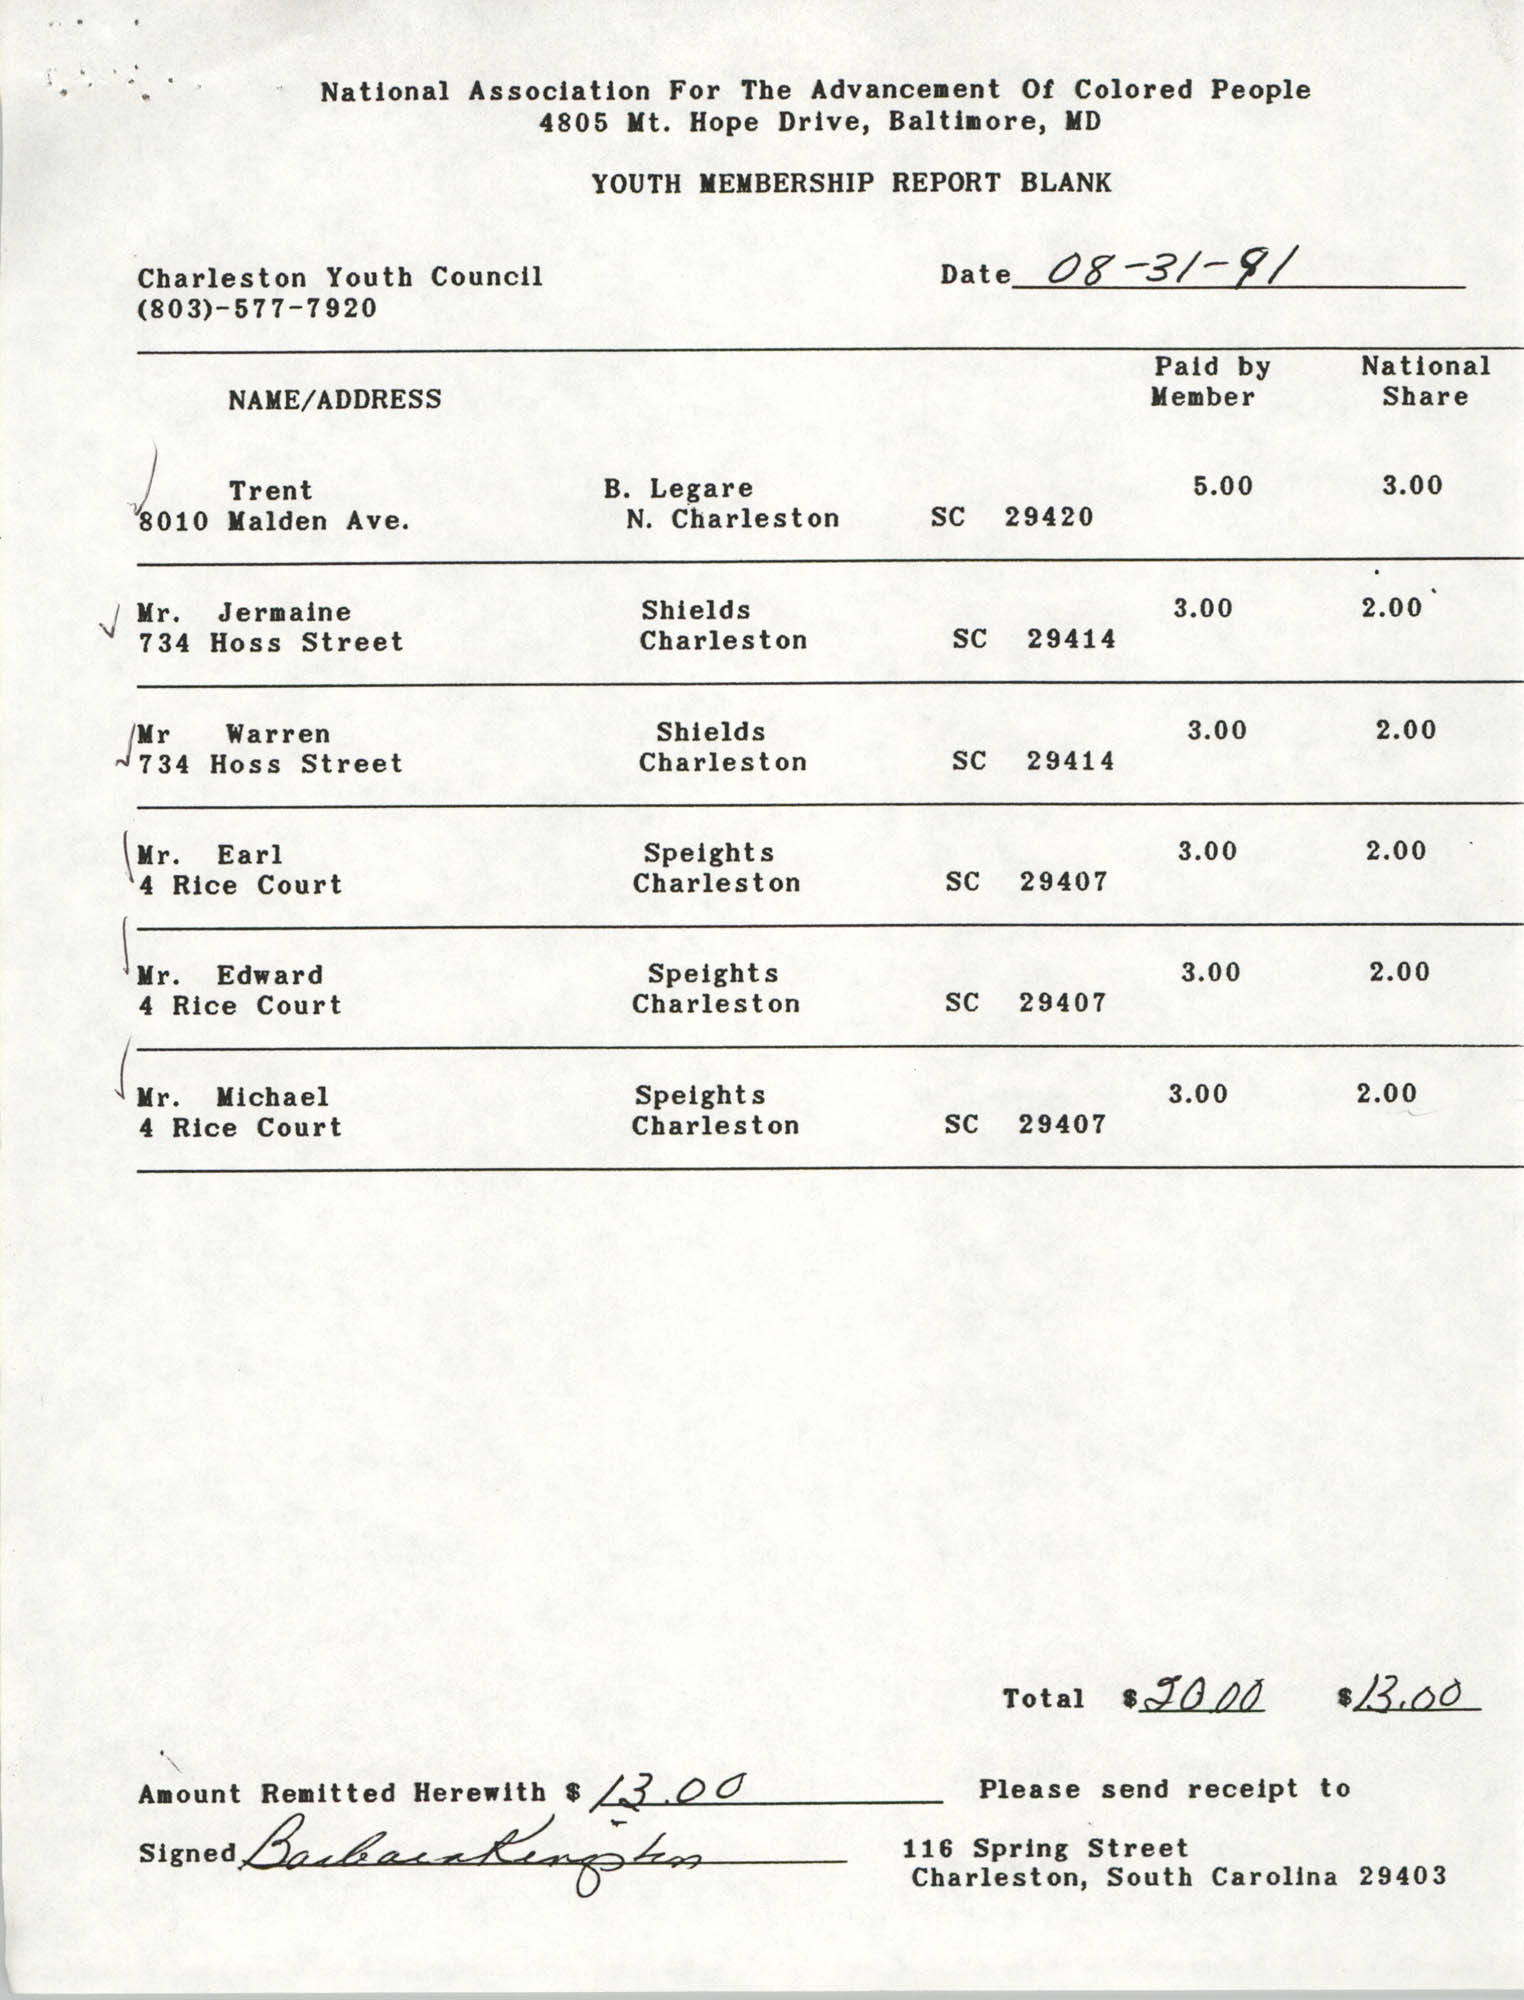 Youth Membership Report Blank, Charleston Youth Council, NAACP, Barbara Kingston, August 31, 1991